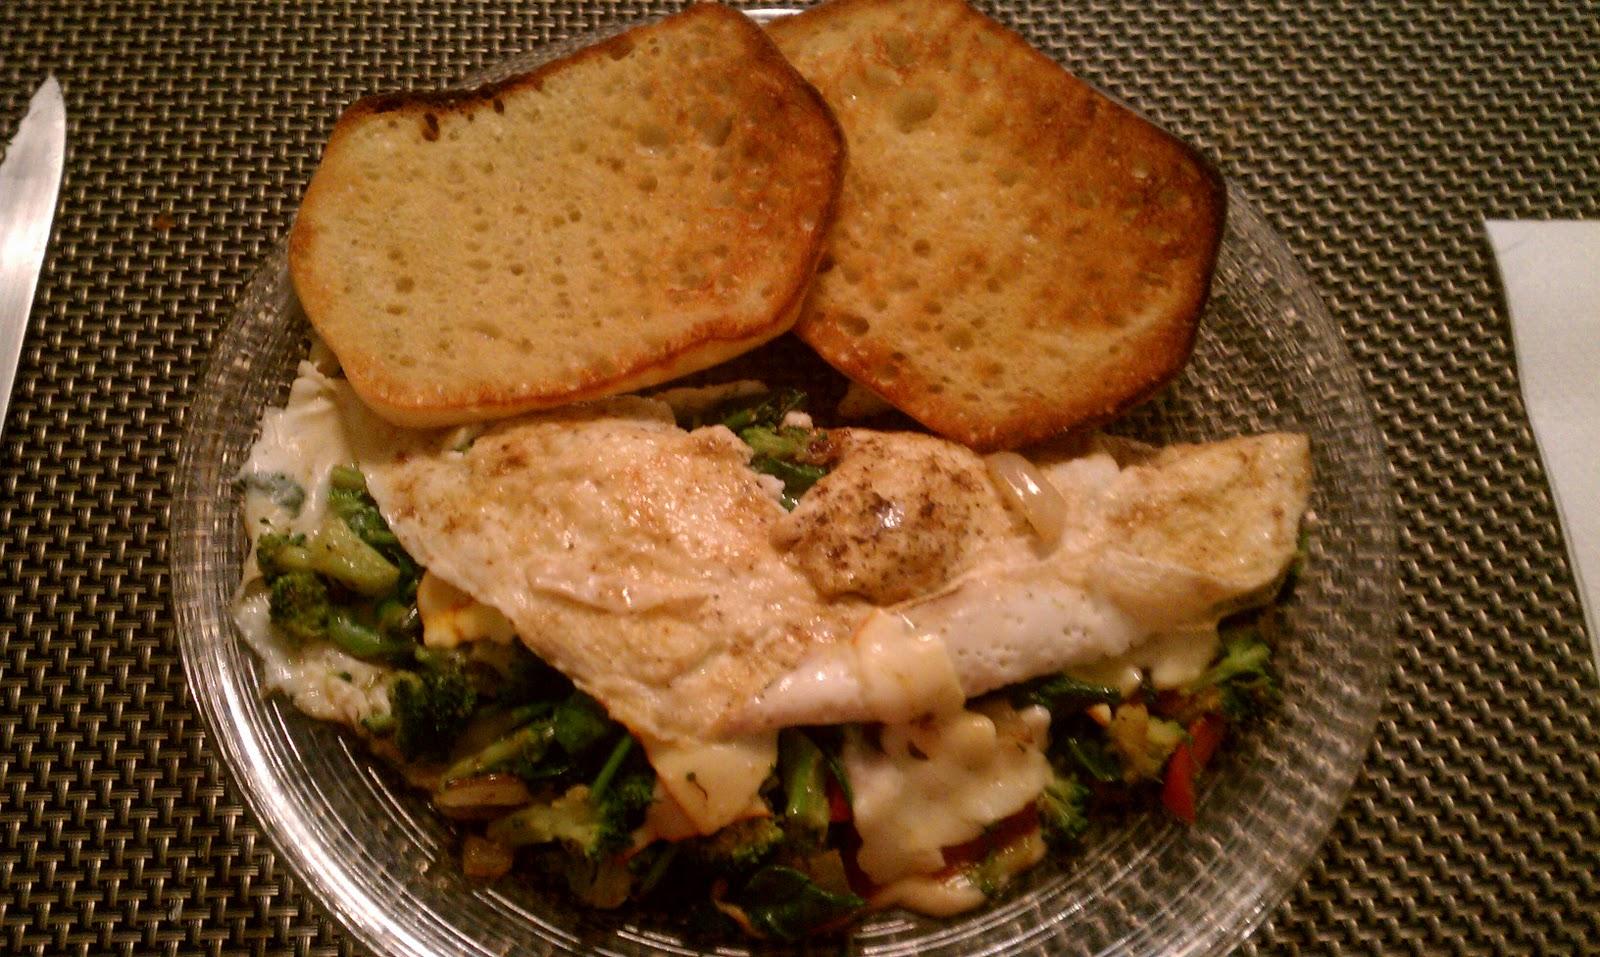 http://2.bp.blogspot.com/-4QXkkU532L4/Twr5GffvzPI/AAAAAAAAA-M/12Q1z6vq-r8/s1600/Veggie+Egg+White+Omelette+and+Toast.jpg